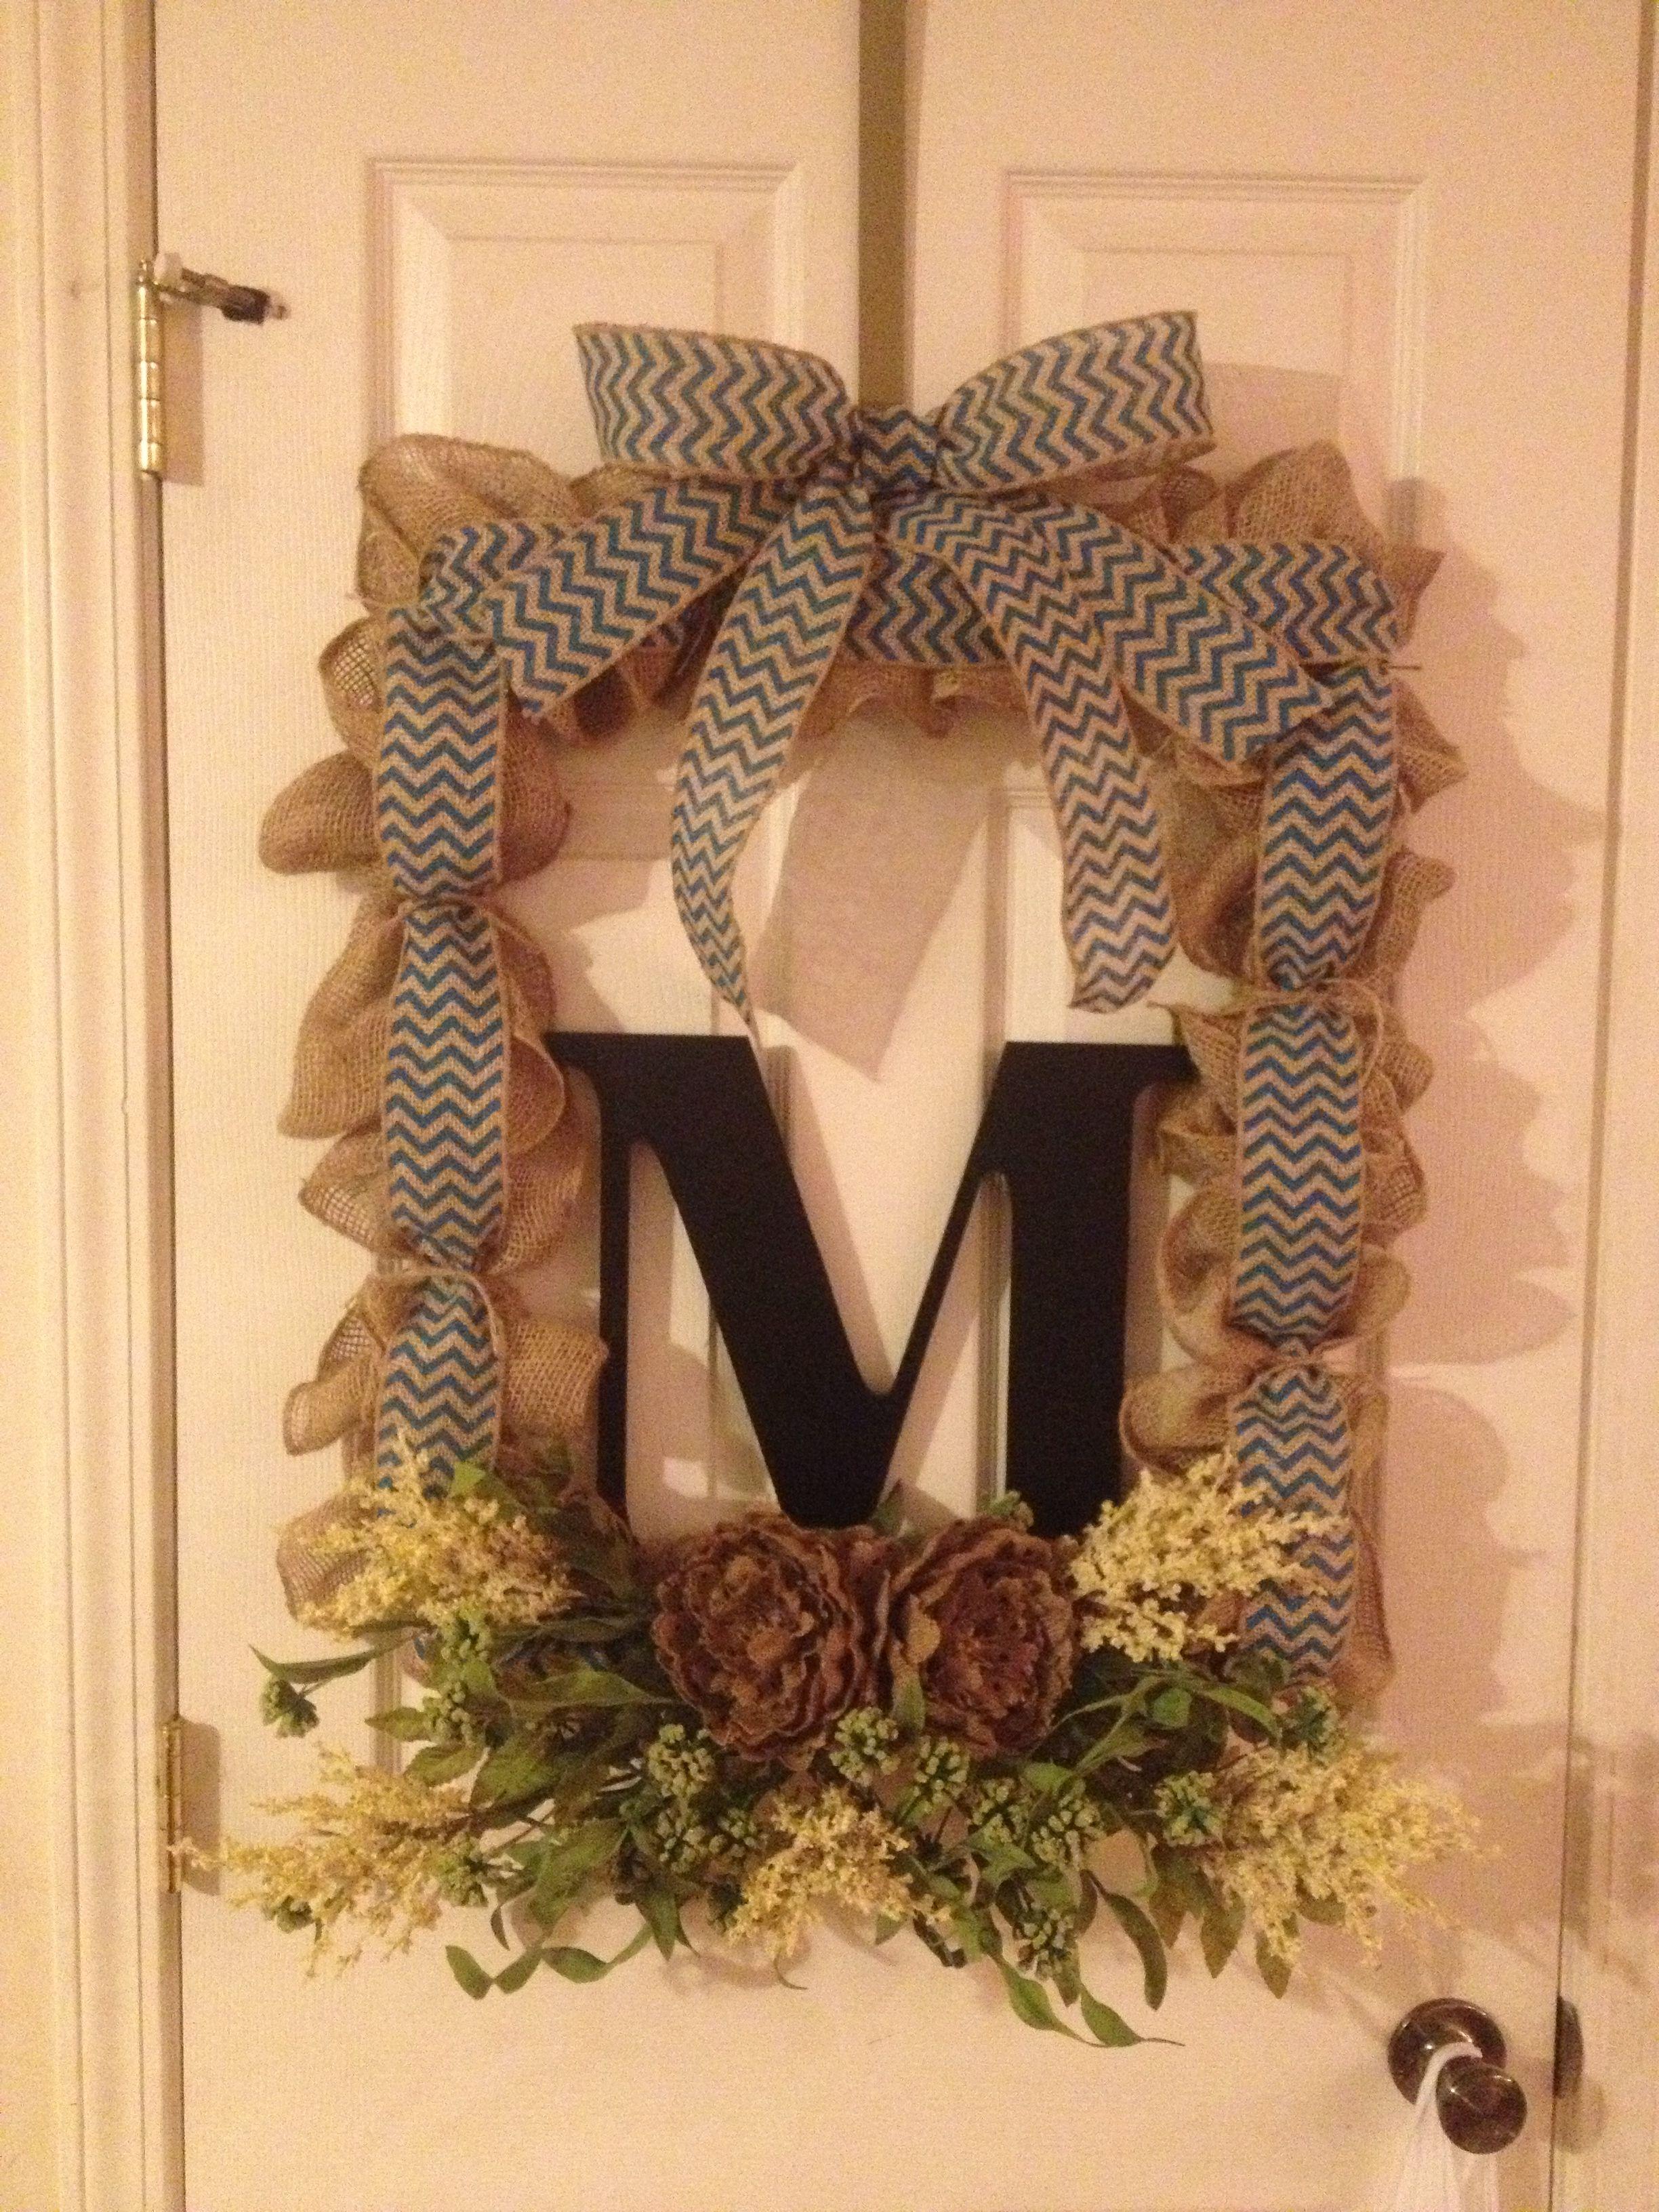 Burlap wreath using square frame and initial Wreath